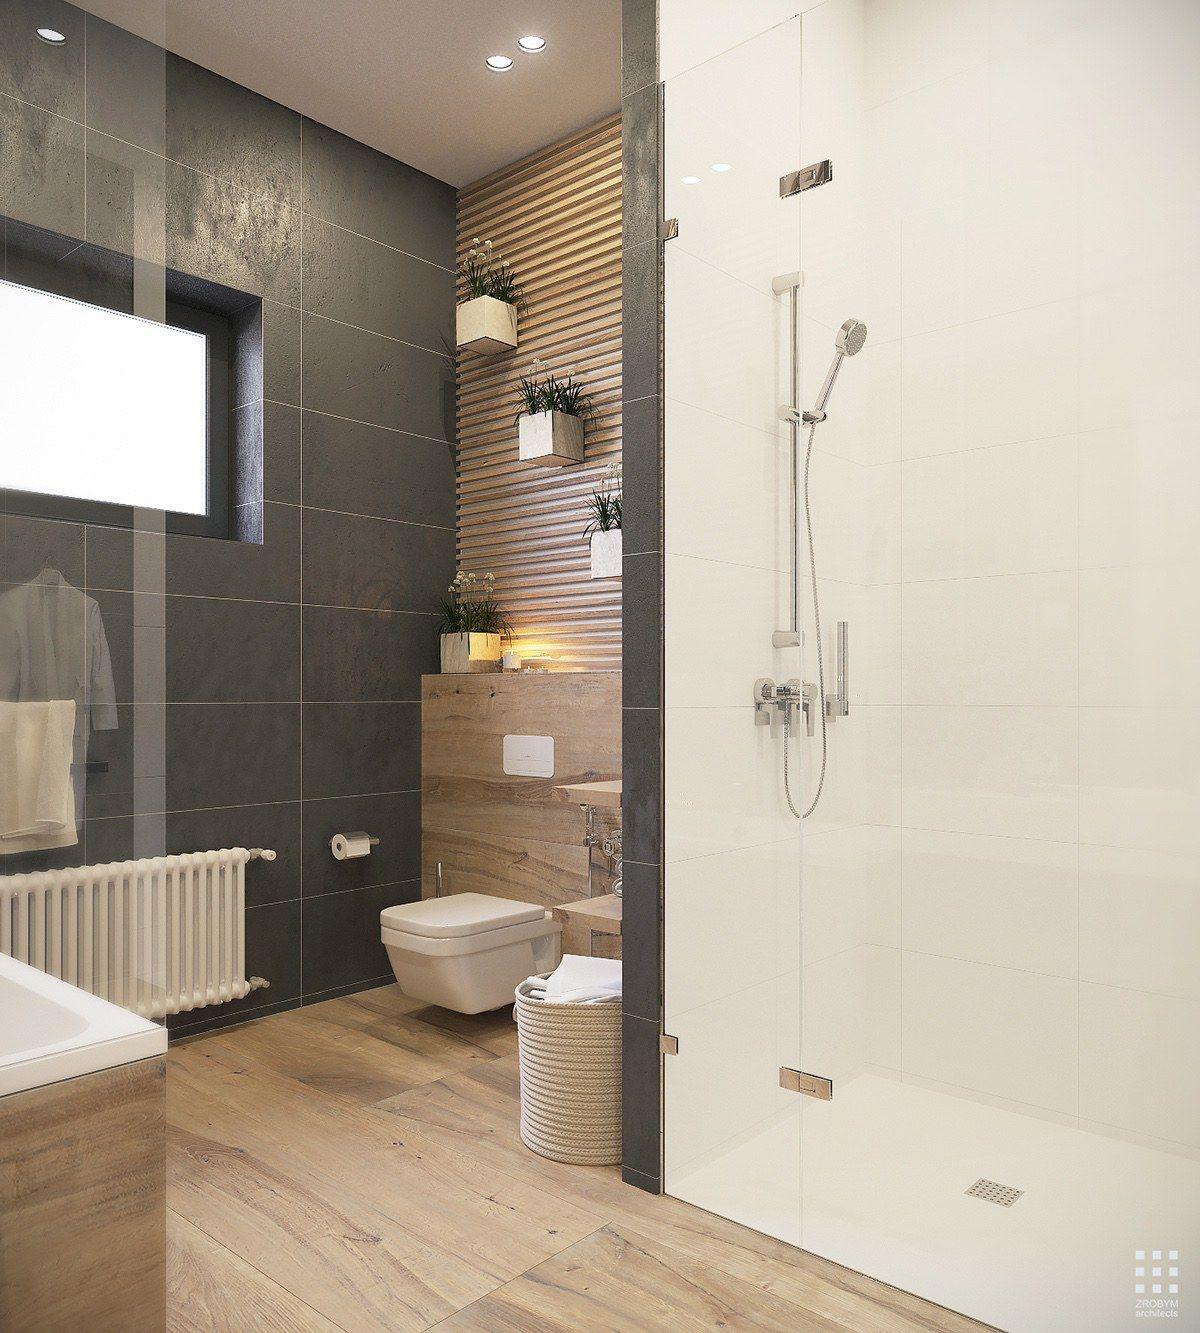 An Organic Modern Home With Subtle Industrial Undertones Avec Images Idee Salle De Bain Amenagement Salle De Bain Decoration Salle De Bain